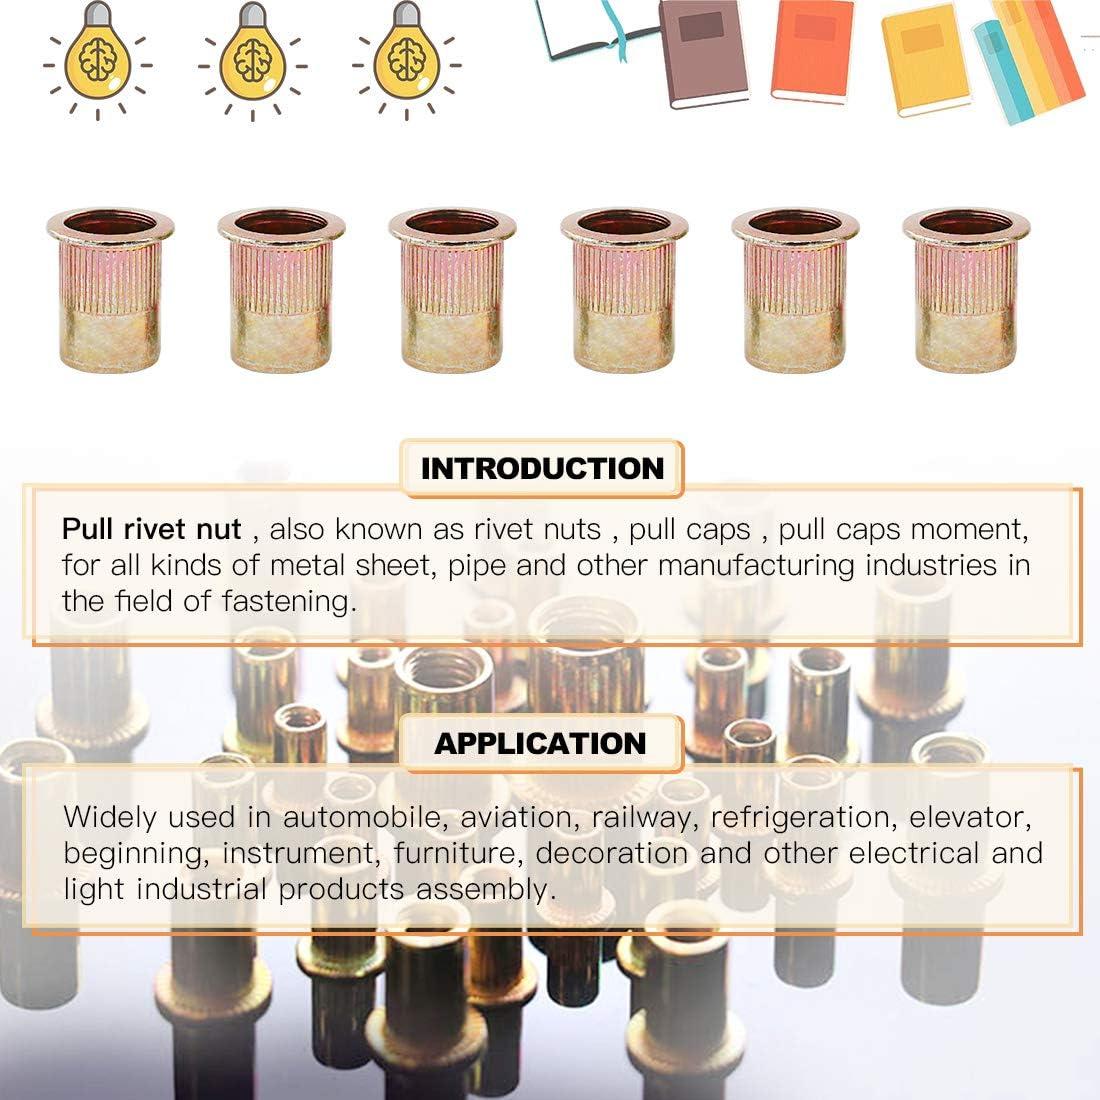 3//8-16 UNC Rivnut 1//4-20 8-32 10-24 5//16-18 5//32-32 Hilitchi 180 Pcs UNC Rivet Nuts Threaded Insert Nut Assortment Kit